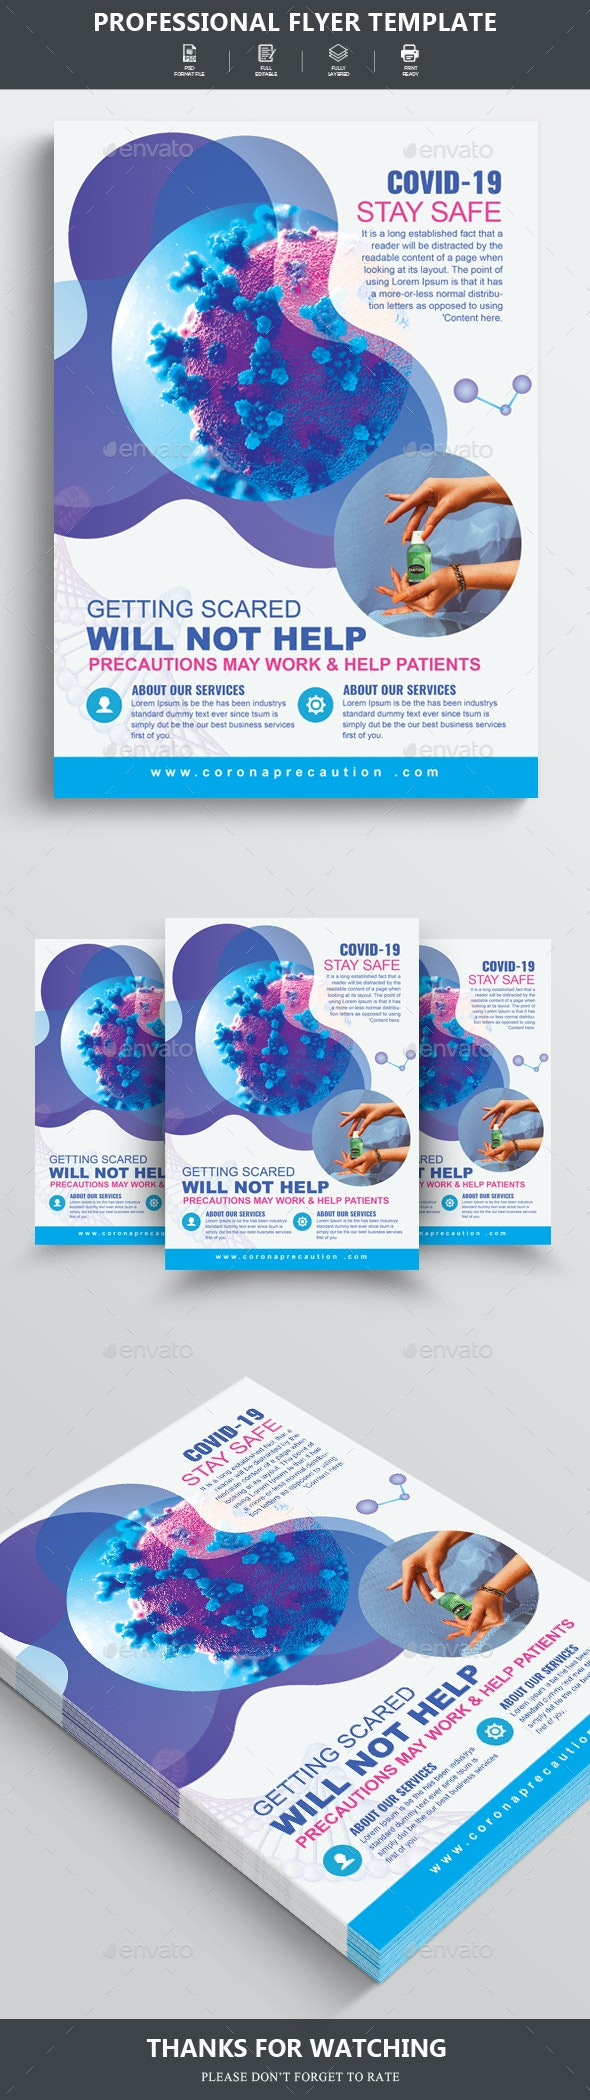 Virus Infection Awareness Flyer Template - Corporate Flyers